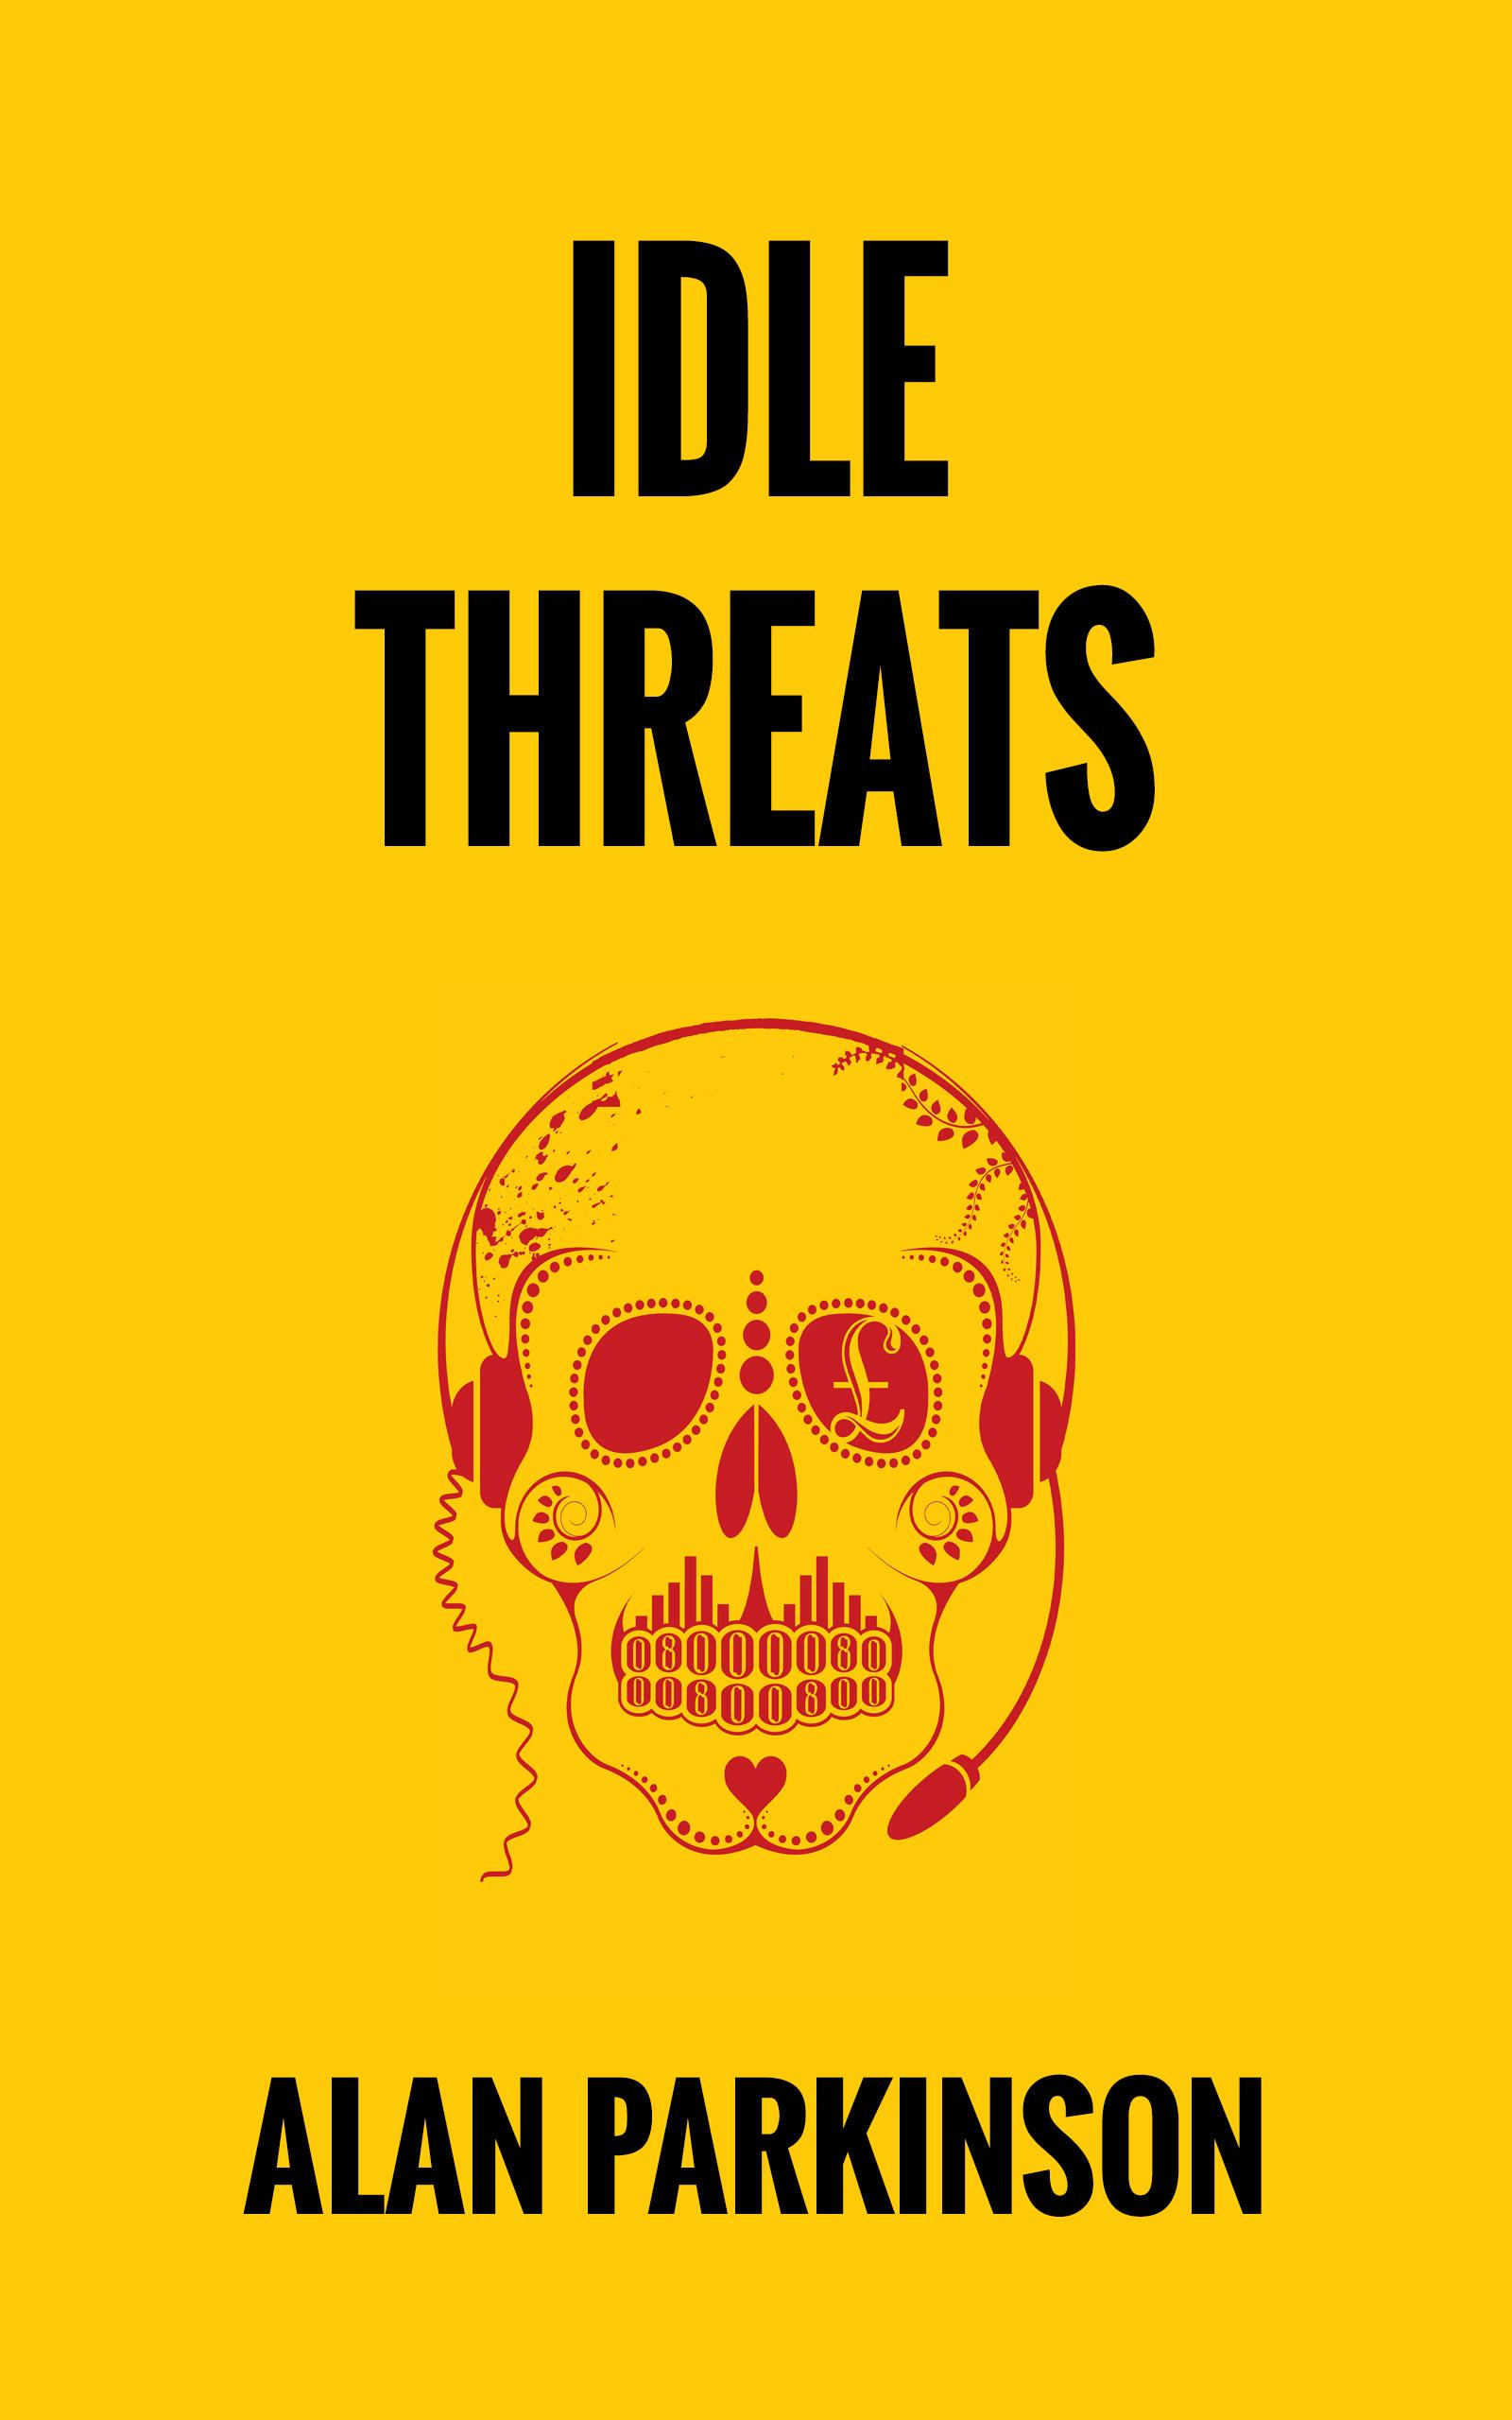 Idle Threats